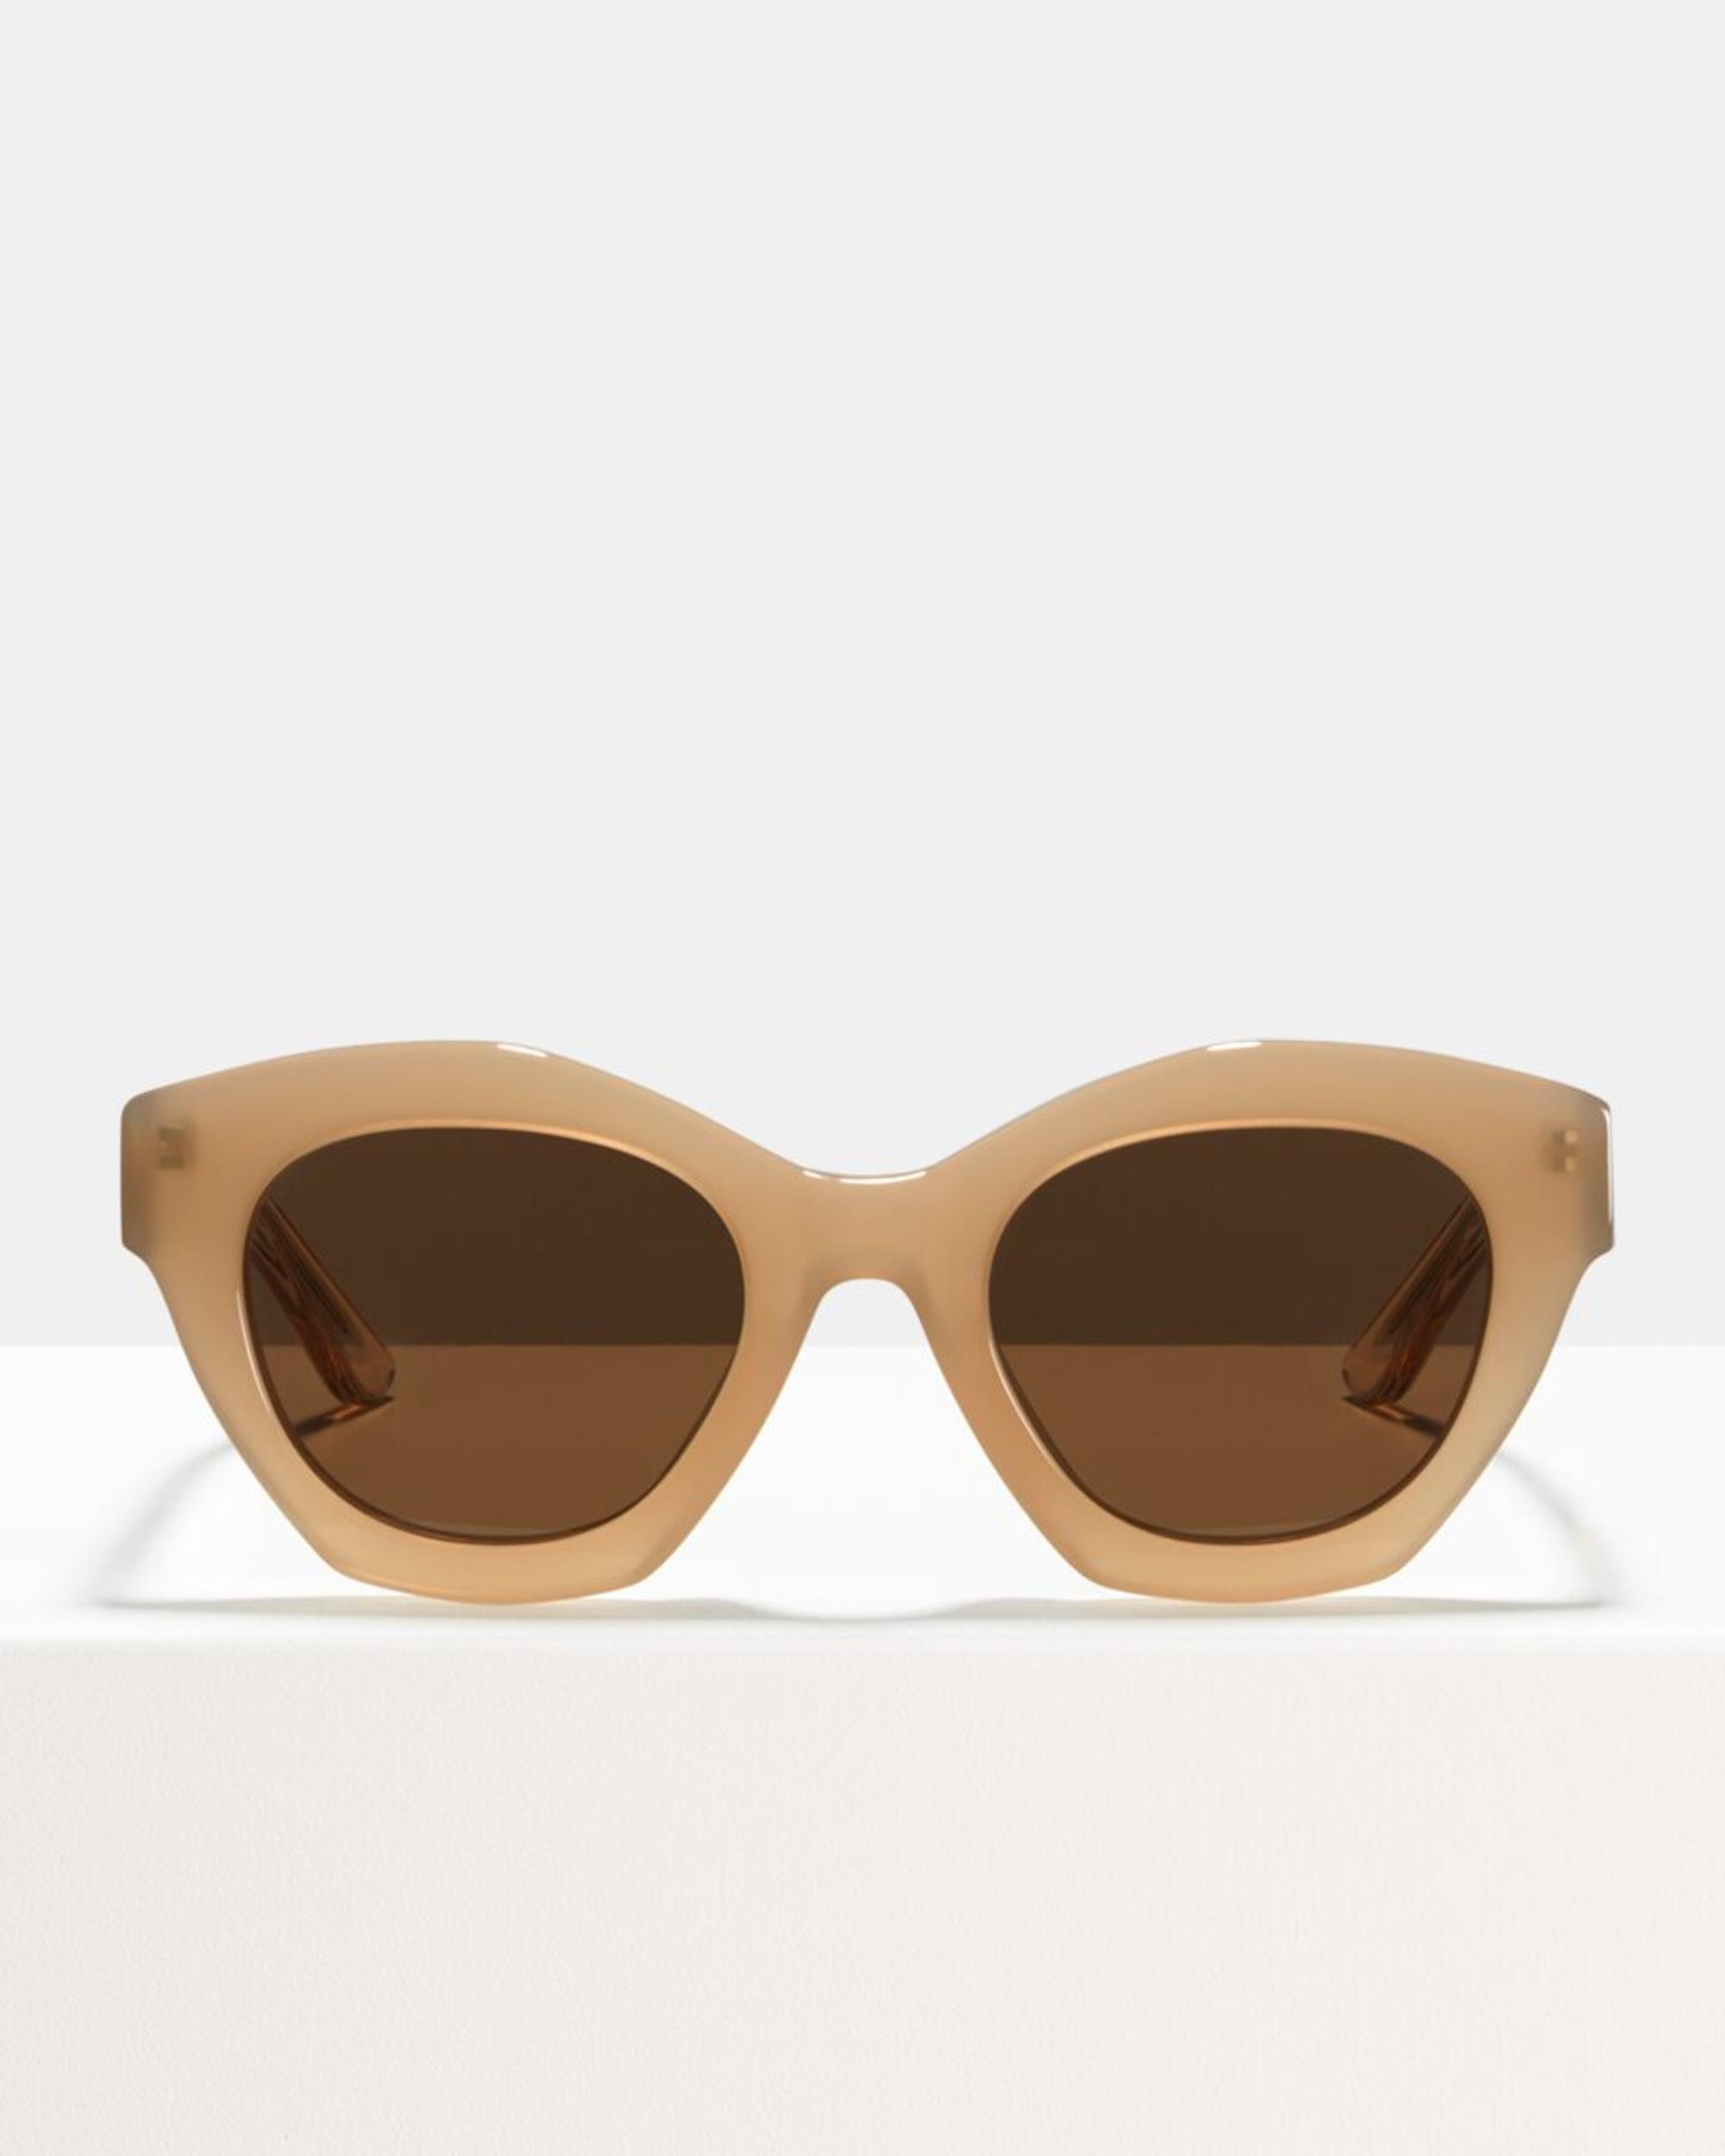 Ace & Tate Sunglasses |  Acetat in Beige